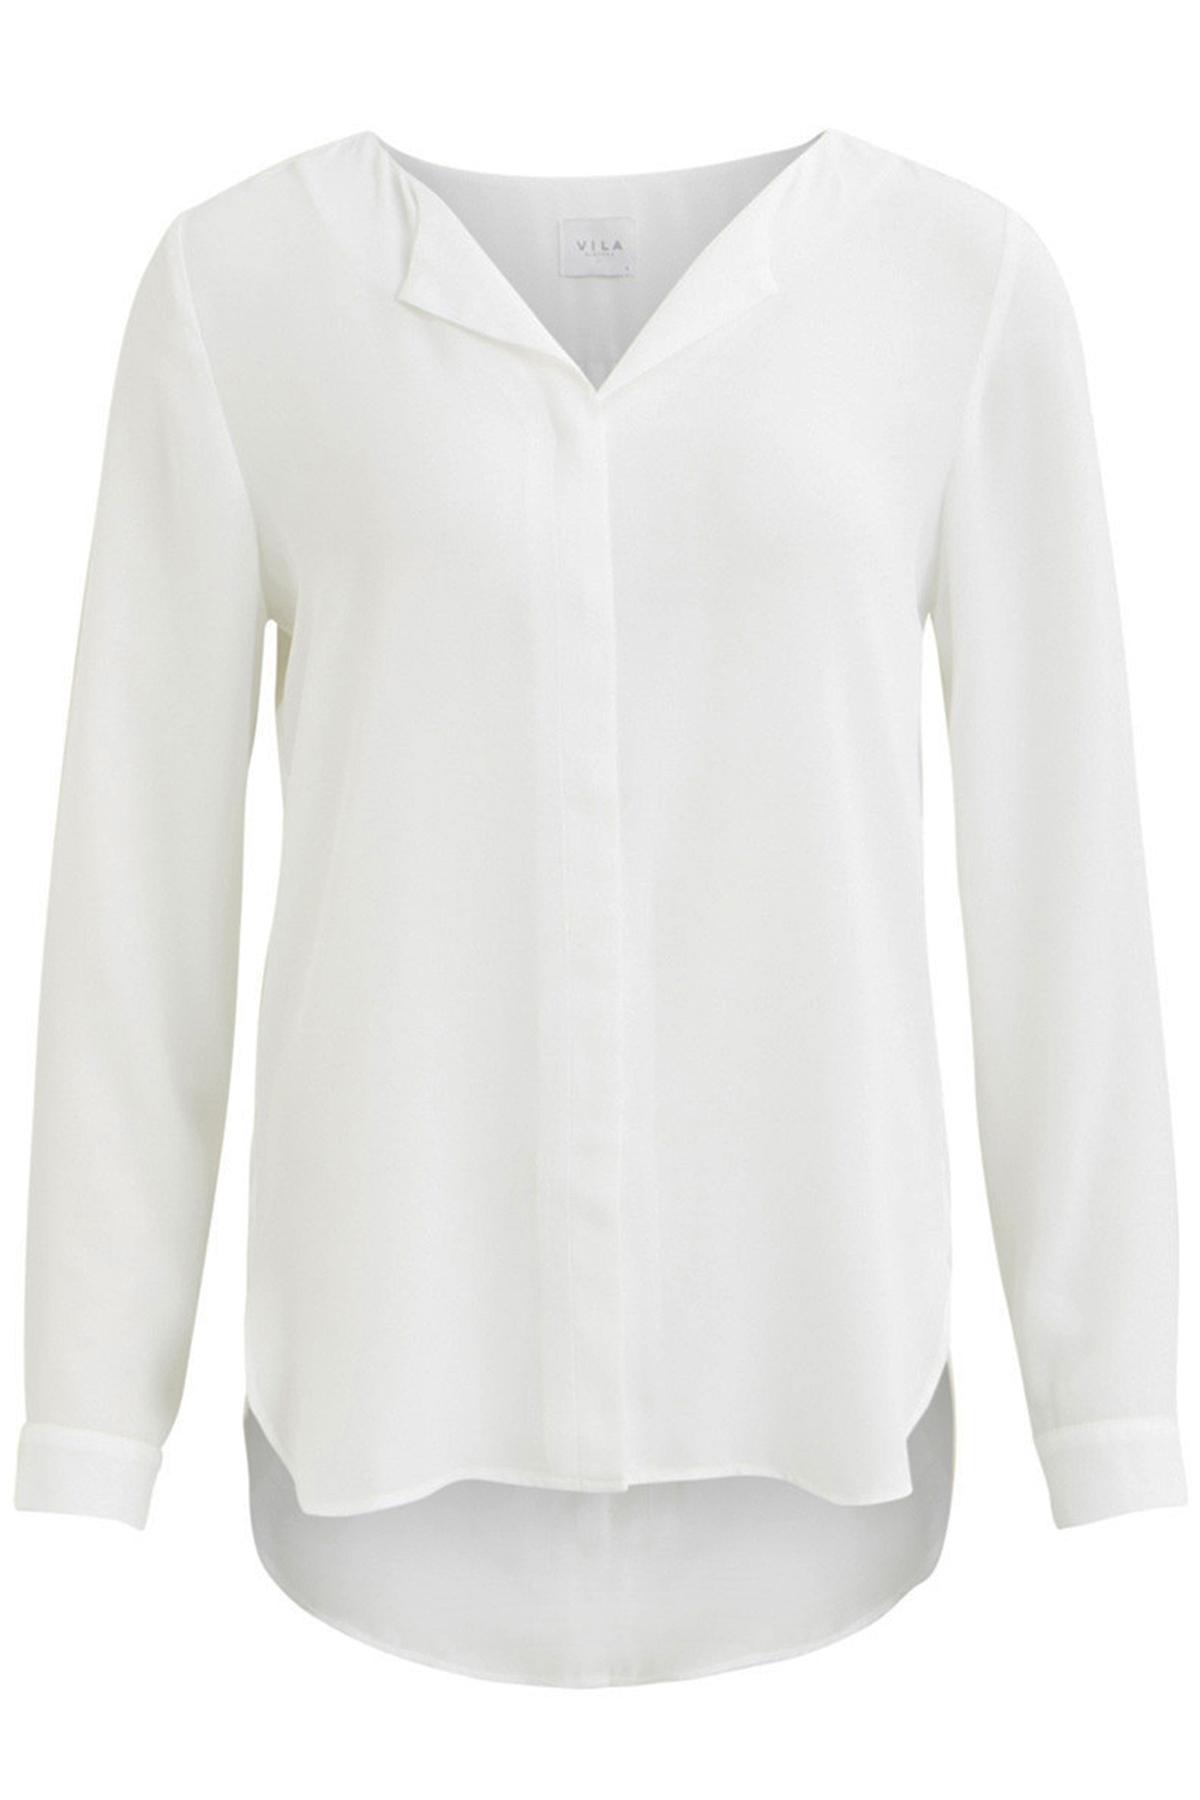 Vila Shirt - Top Wit 14044253